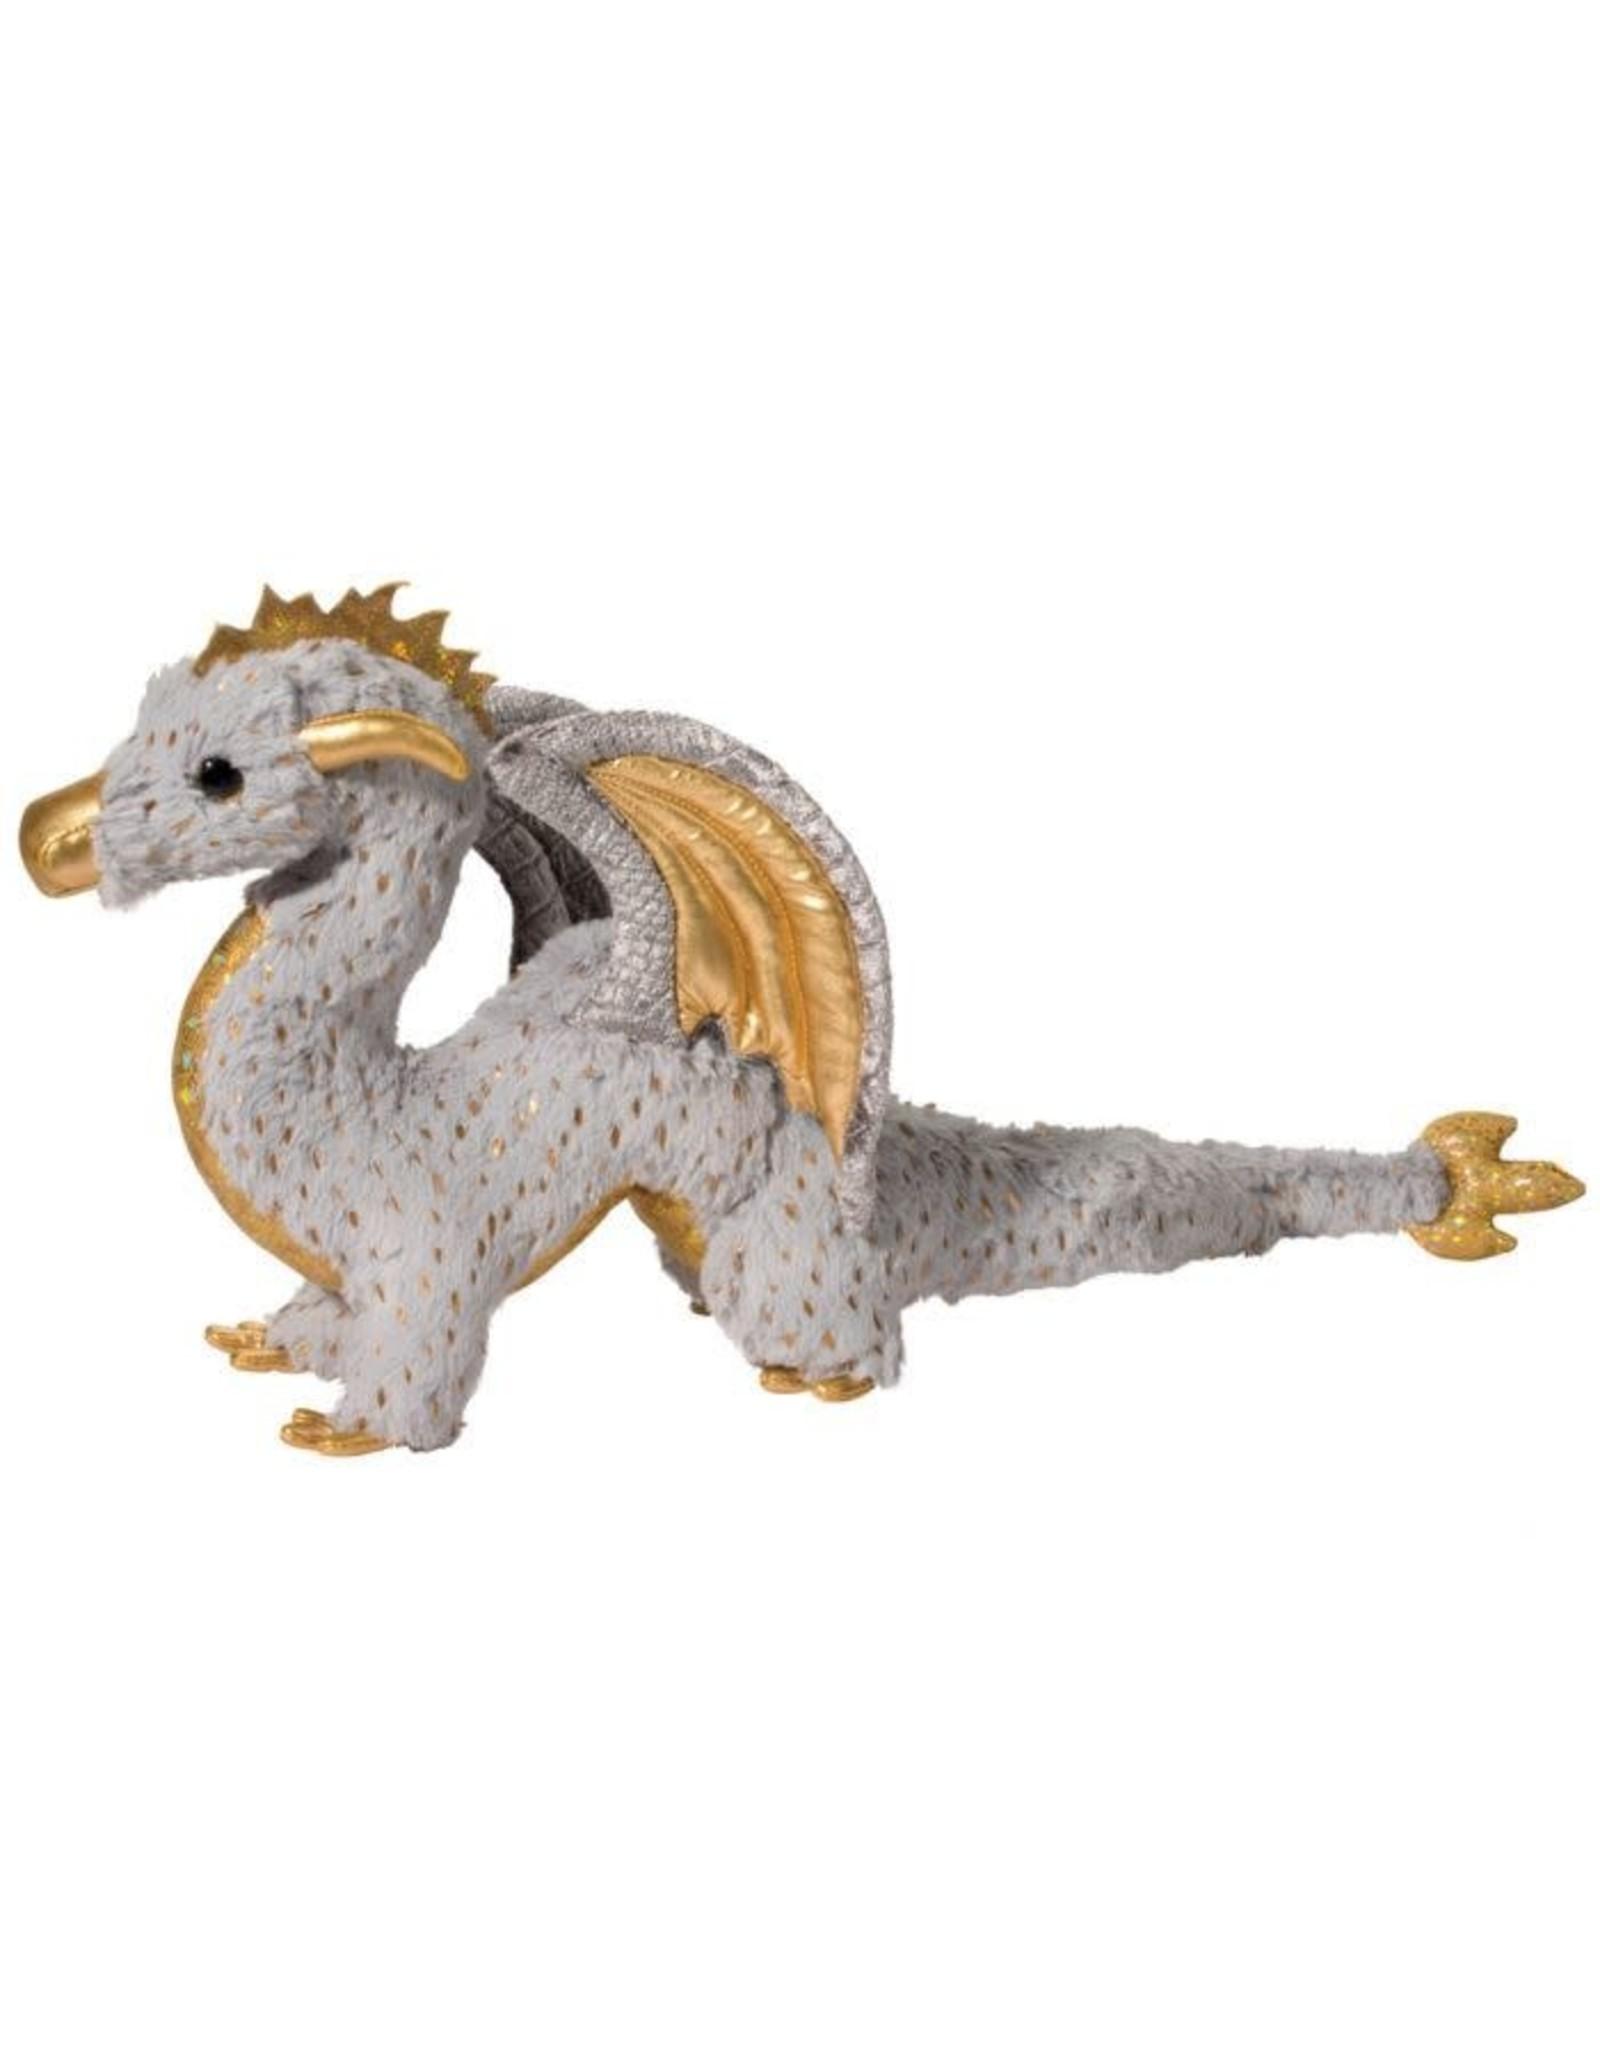 Midas - gold fleck dragon